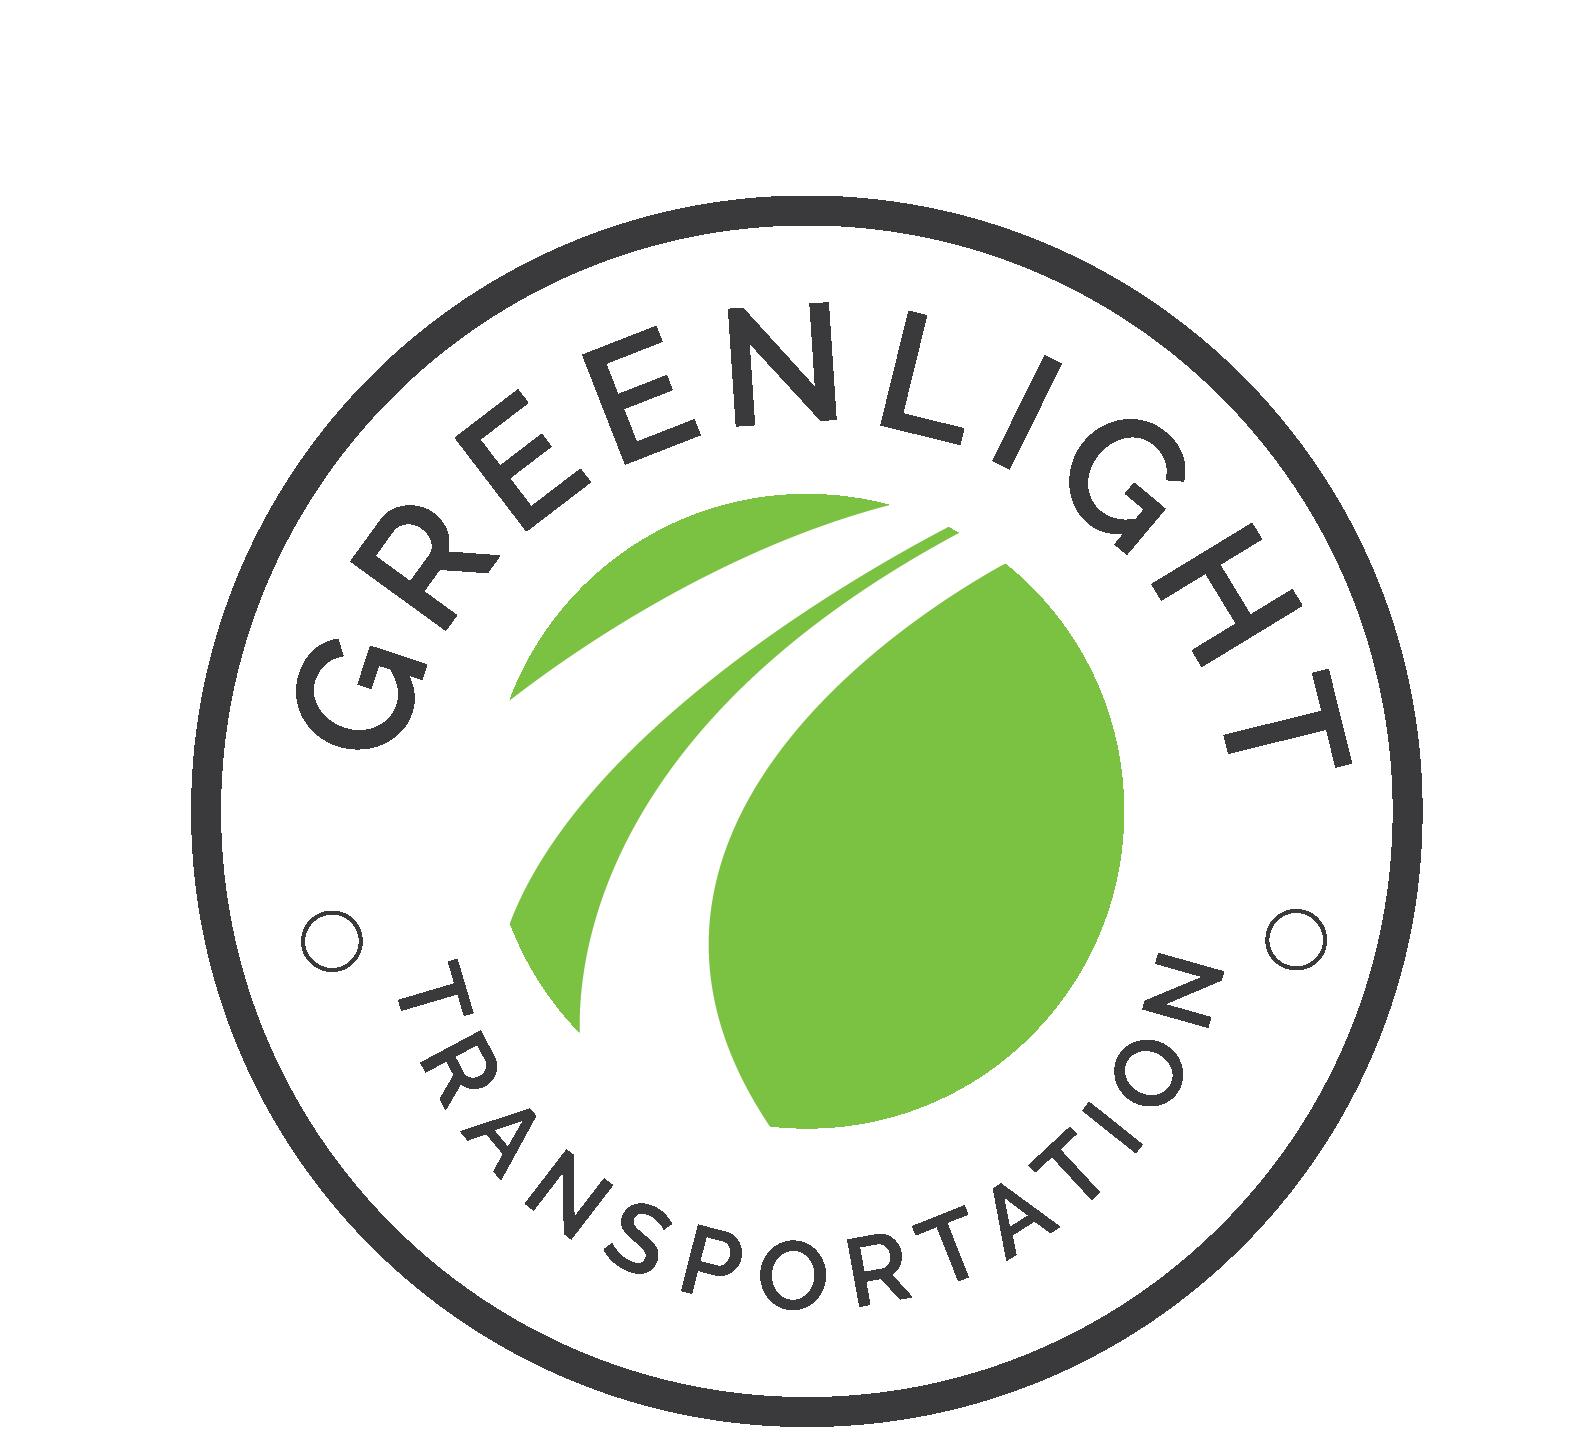 GreenlightCircle